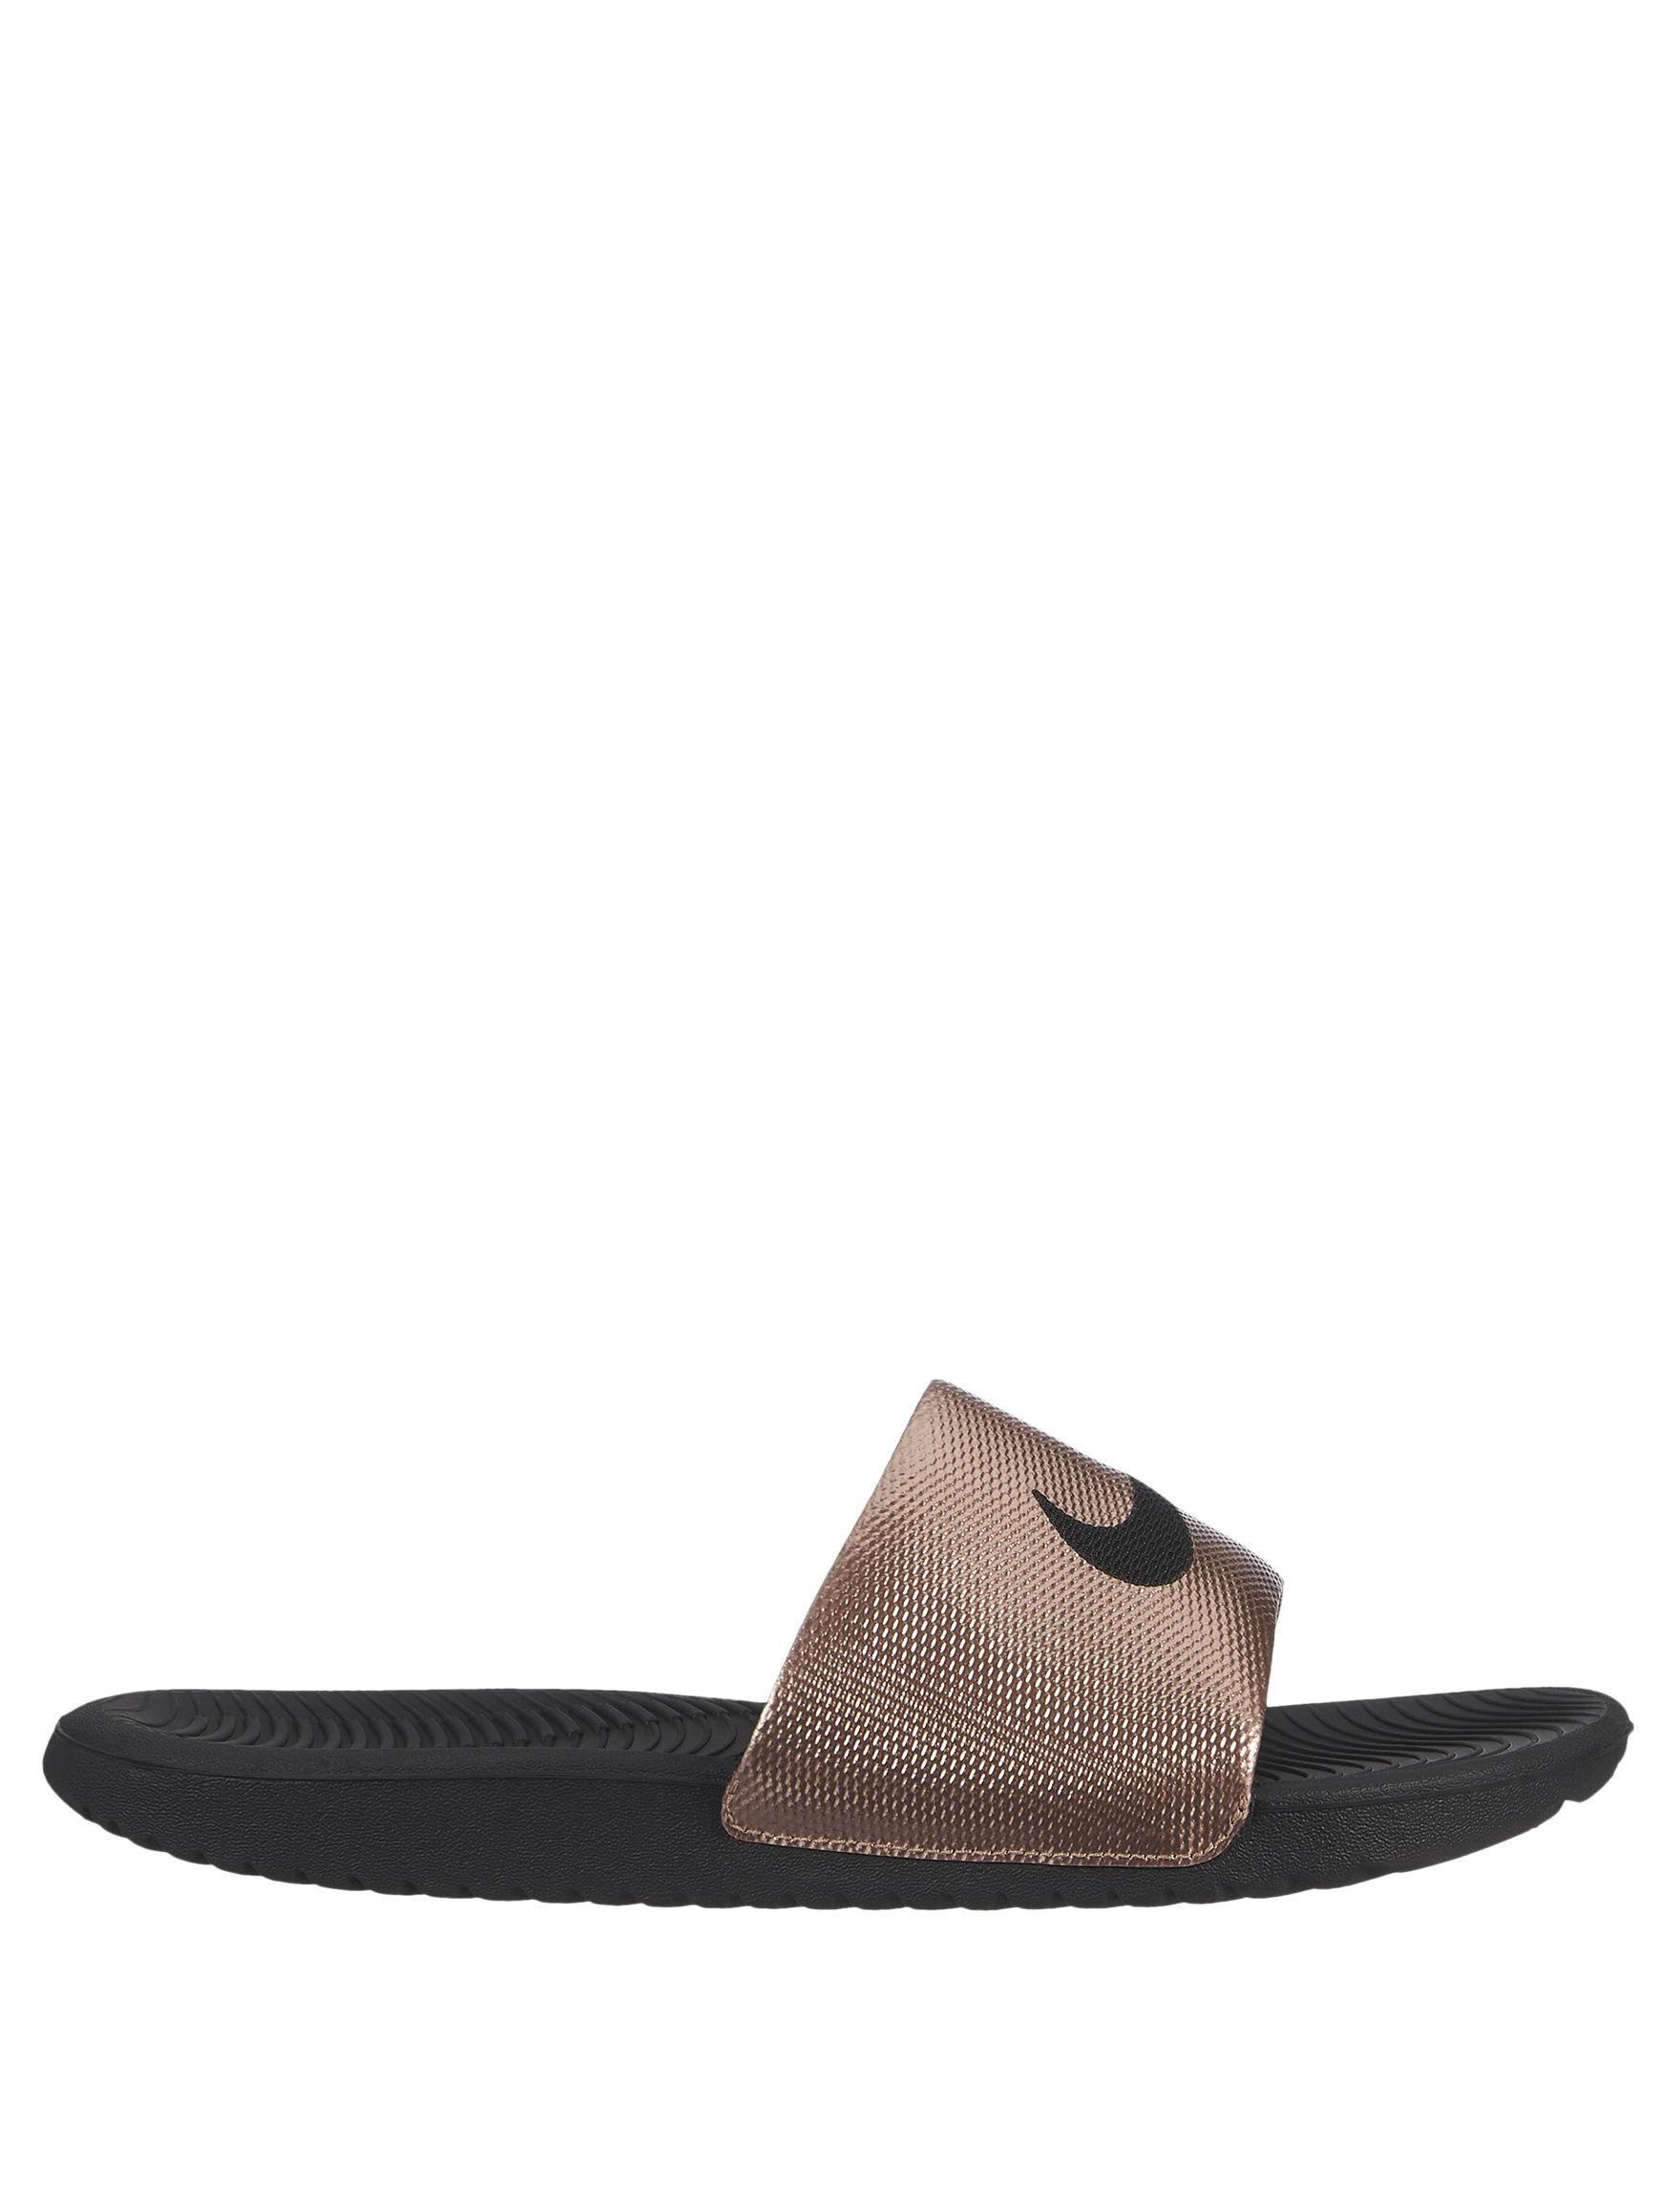 8c1a4675d Nike Women s Kawa Slide Sandals